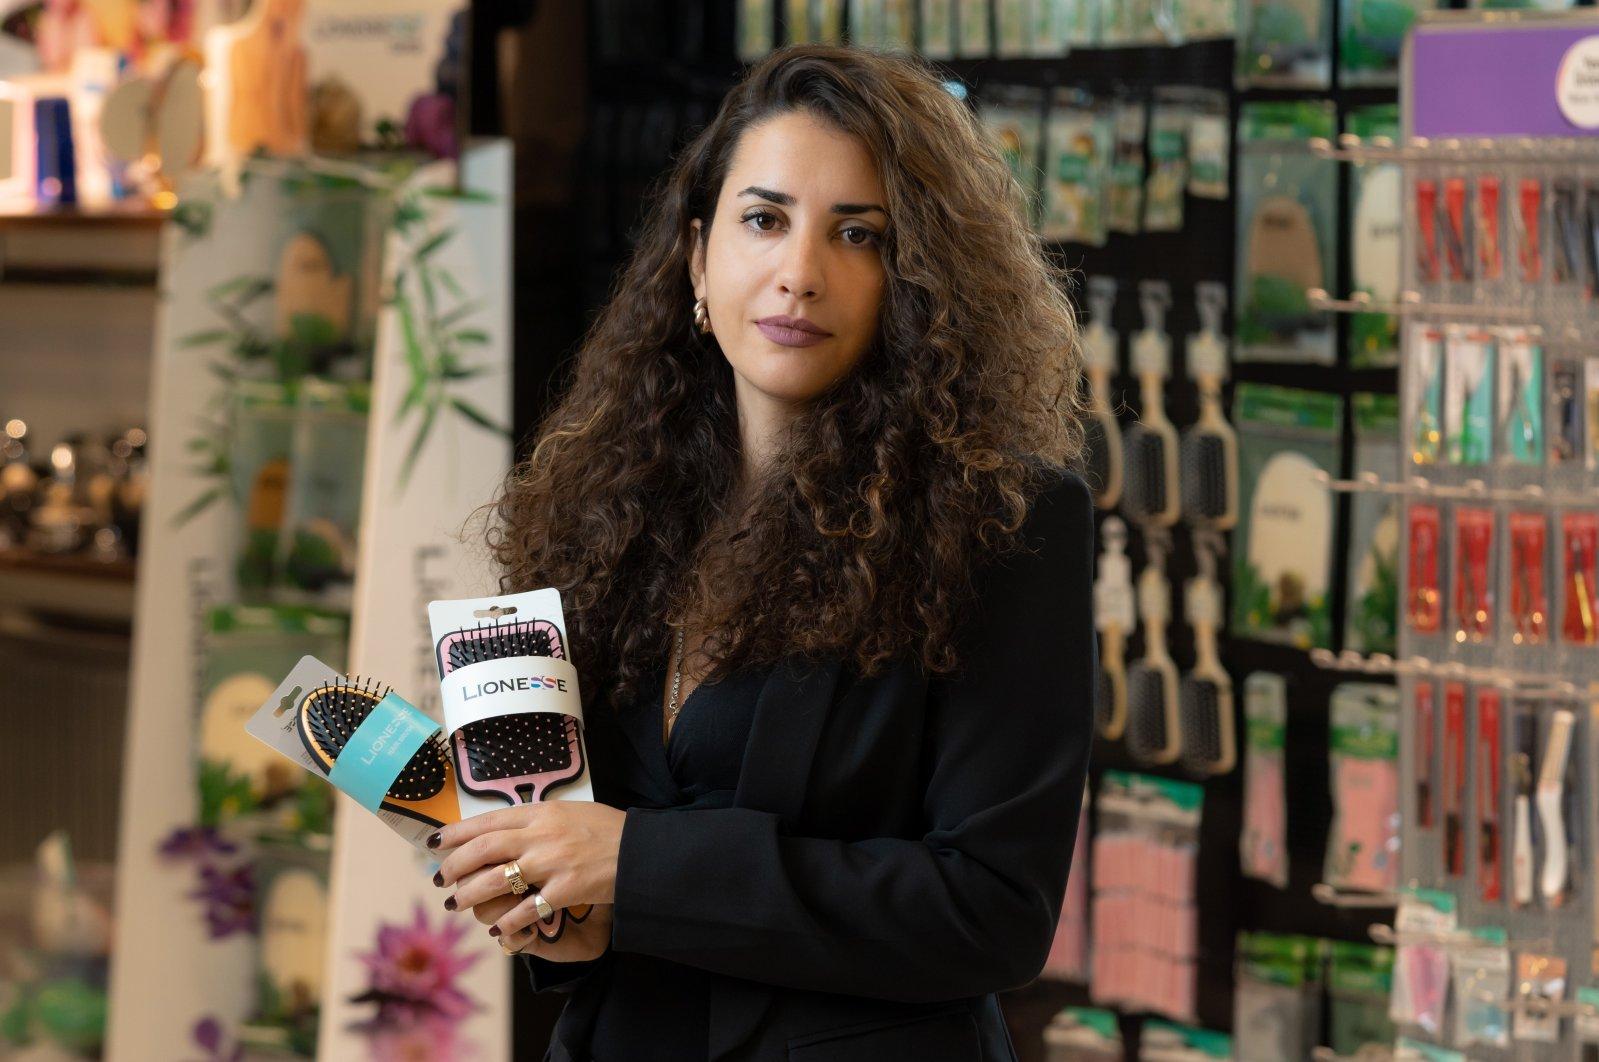 Lara Eram, a sales and business development manager at Tarko Kozmetik, one of Turkey's oldest cosmetics brands. (Courtesy of Tarko Kozmetik)